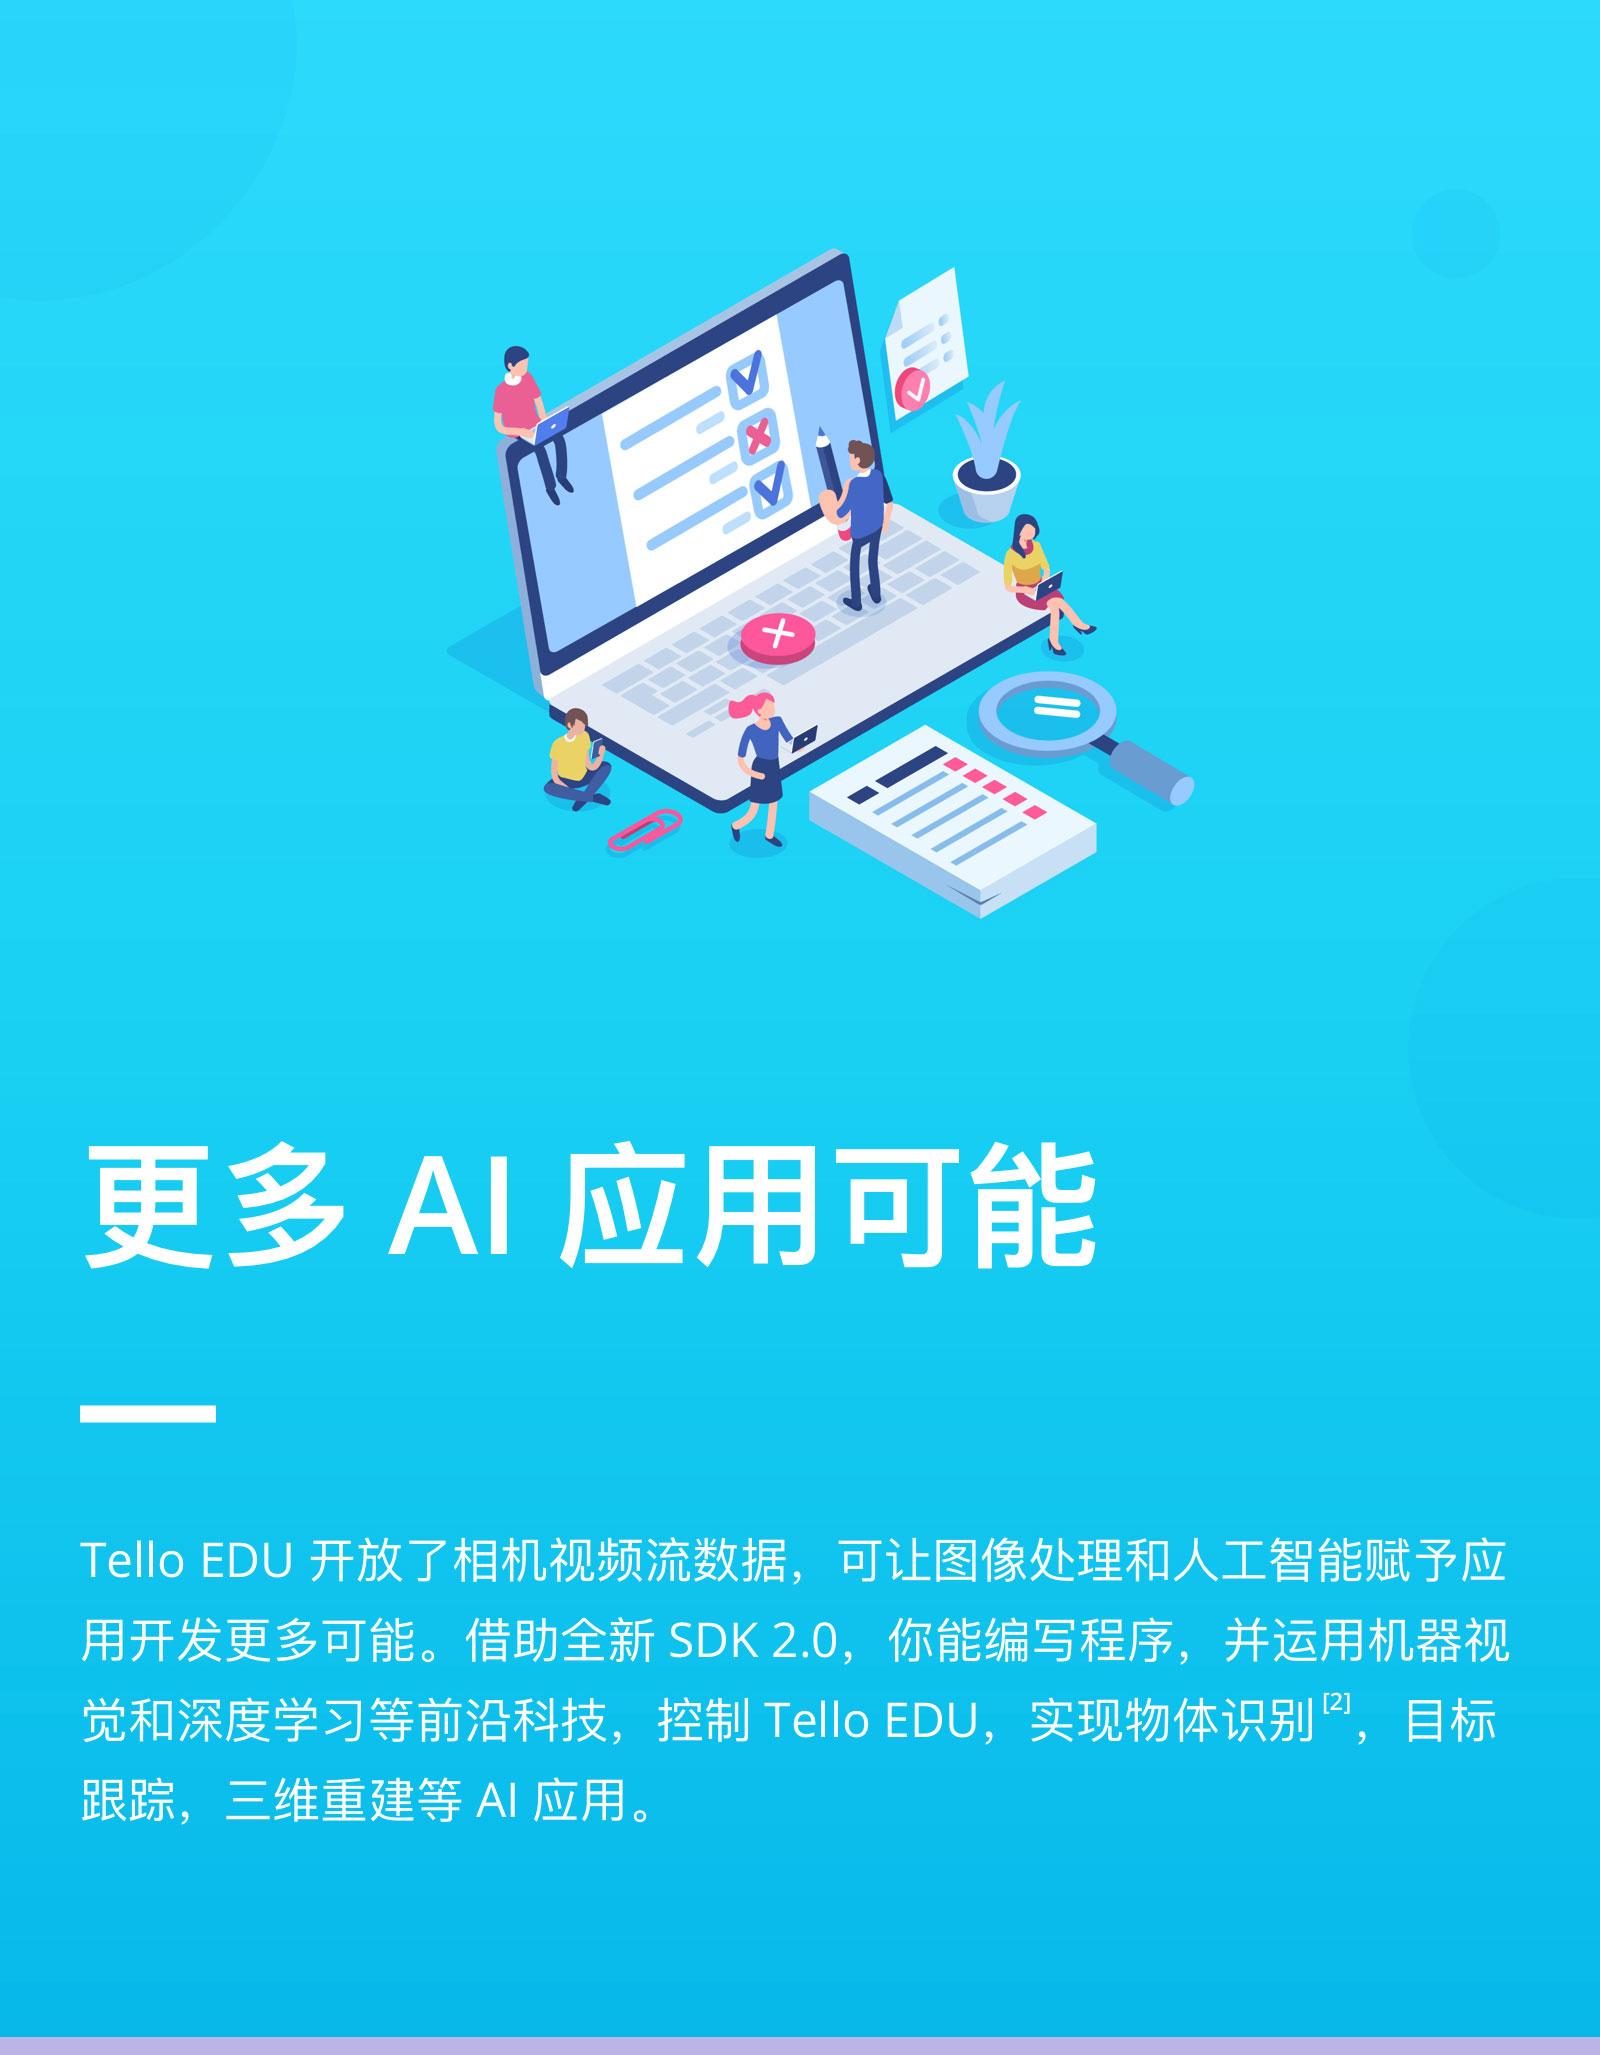 tello-edu-cn-m800-copy_05.jpg